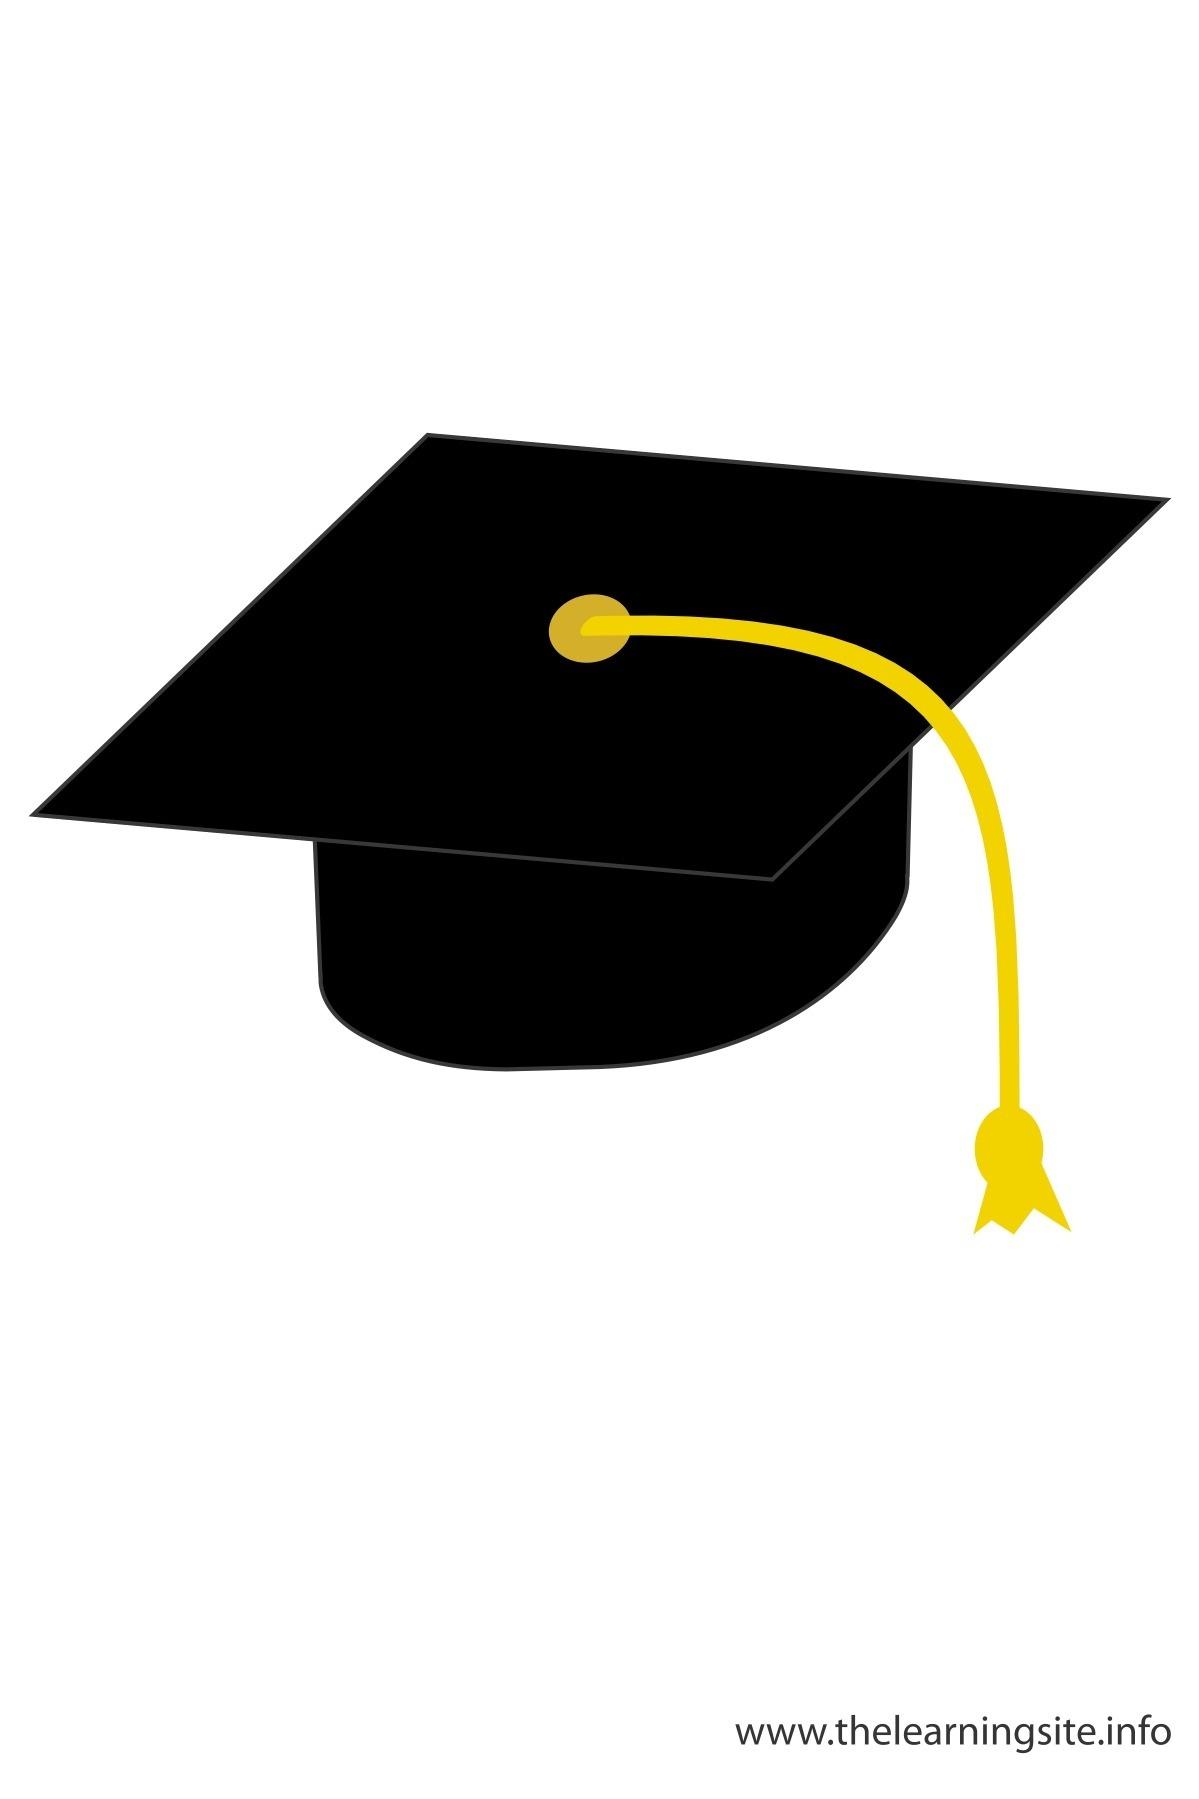 Graduation Clipart Free | Free Download Best Graduation Clipart Free - Graduation Clip Art Free Printable